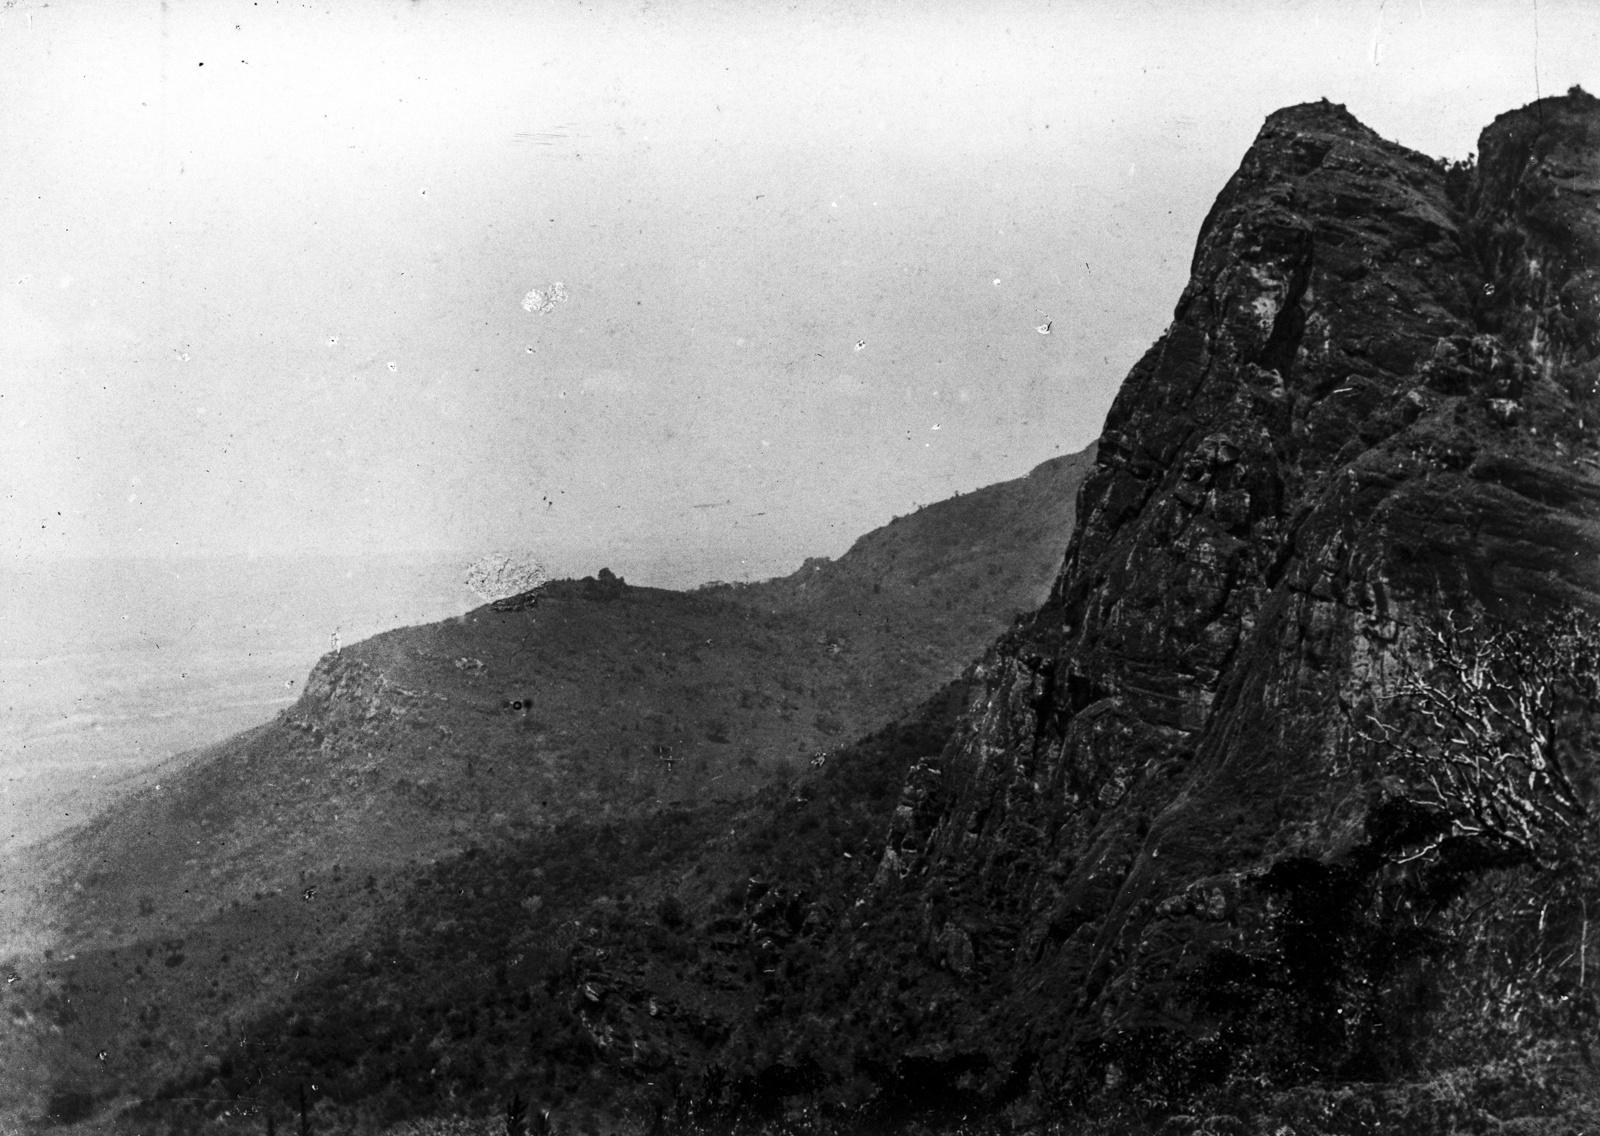 92. Западный склон гор Усамбары